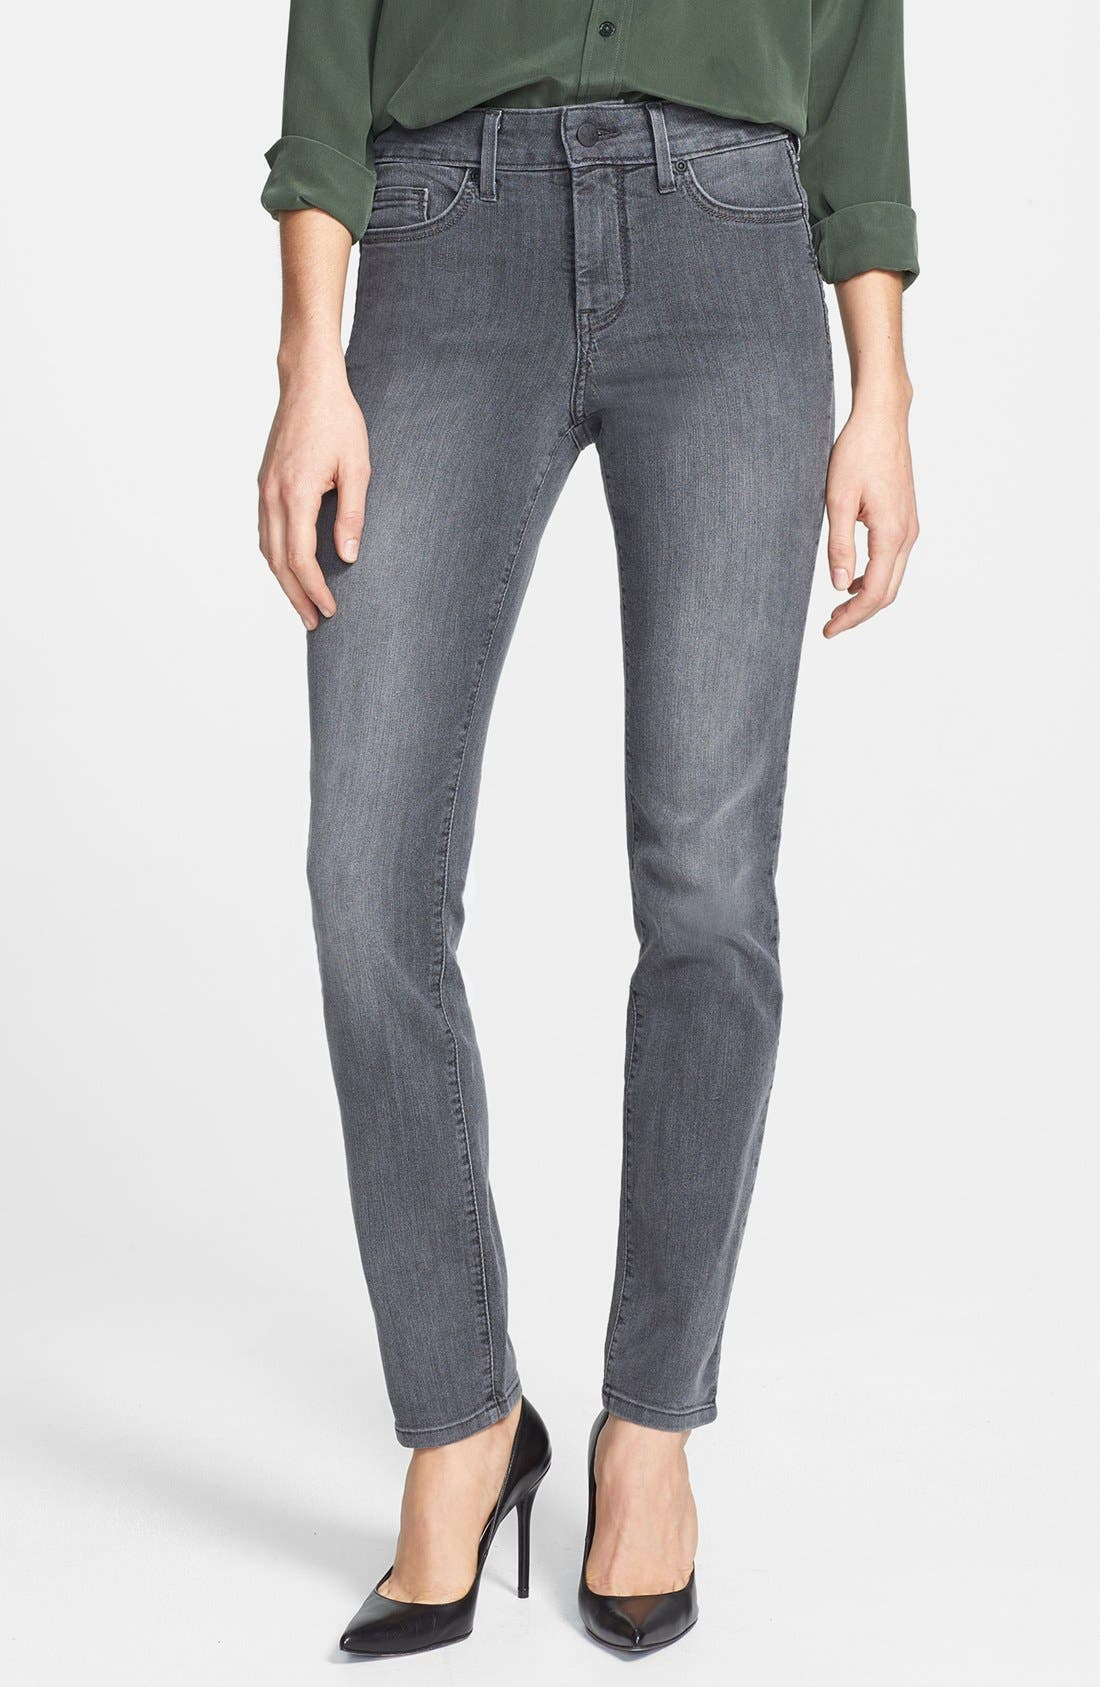 Main Image - NYDJ 'Alina' Stretch Skinny Jeans (Basalt) (Petite)